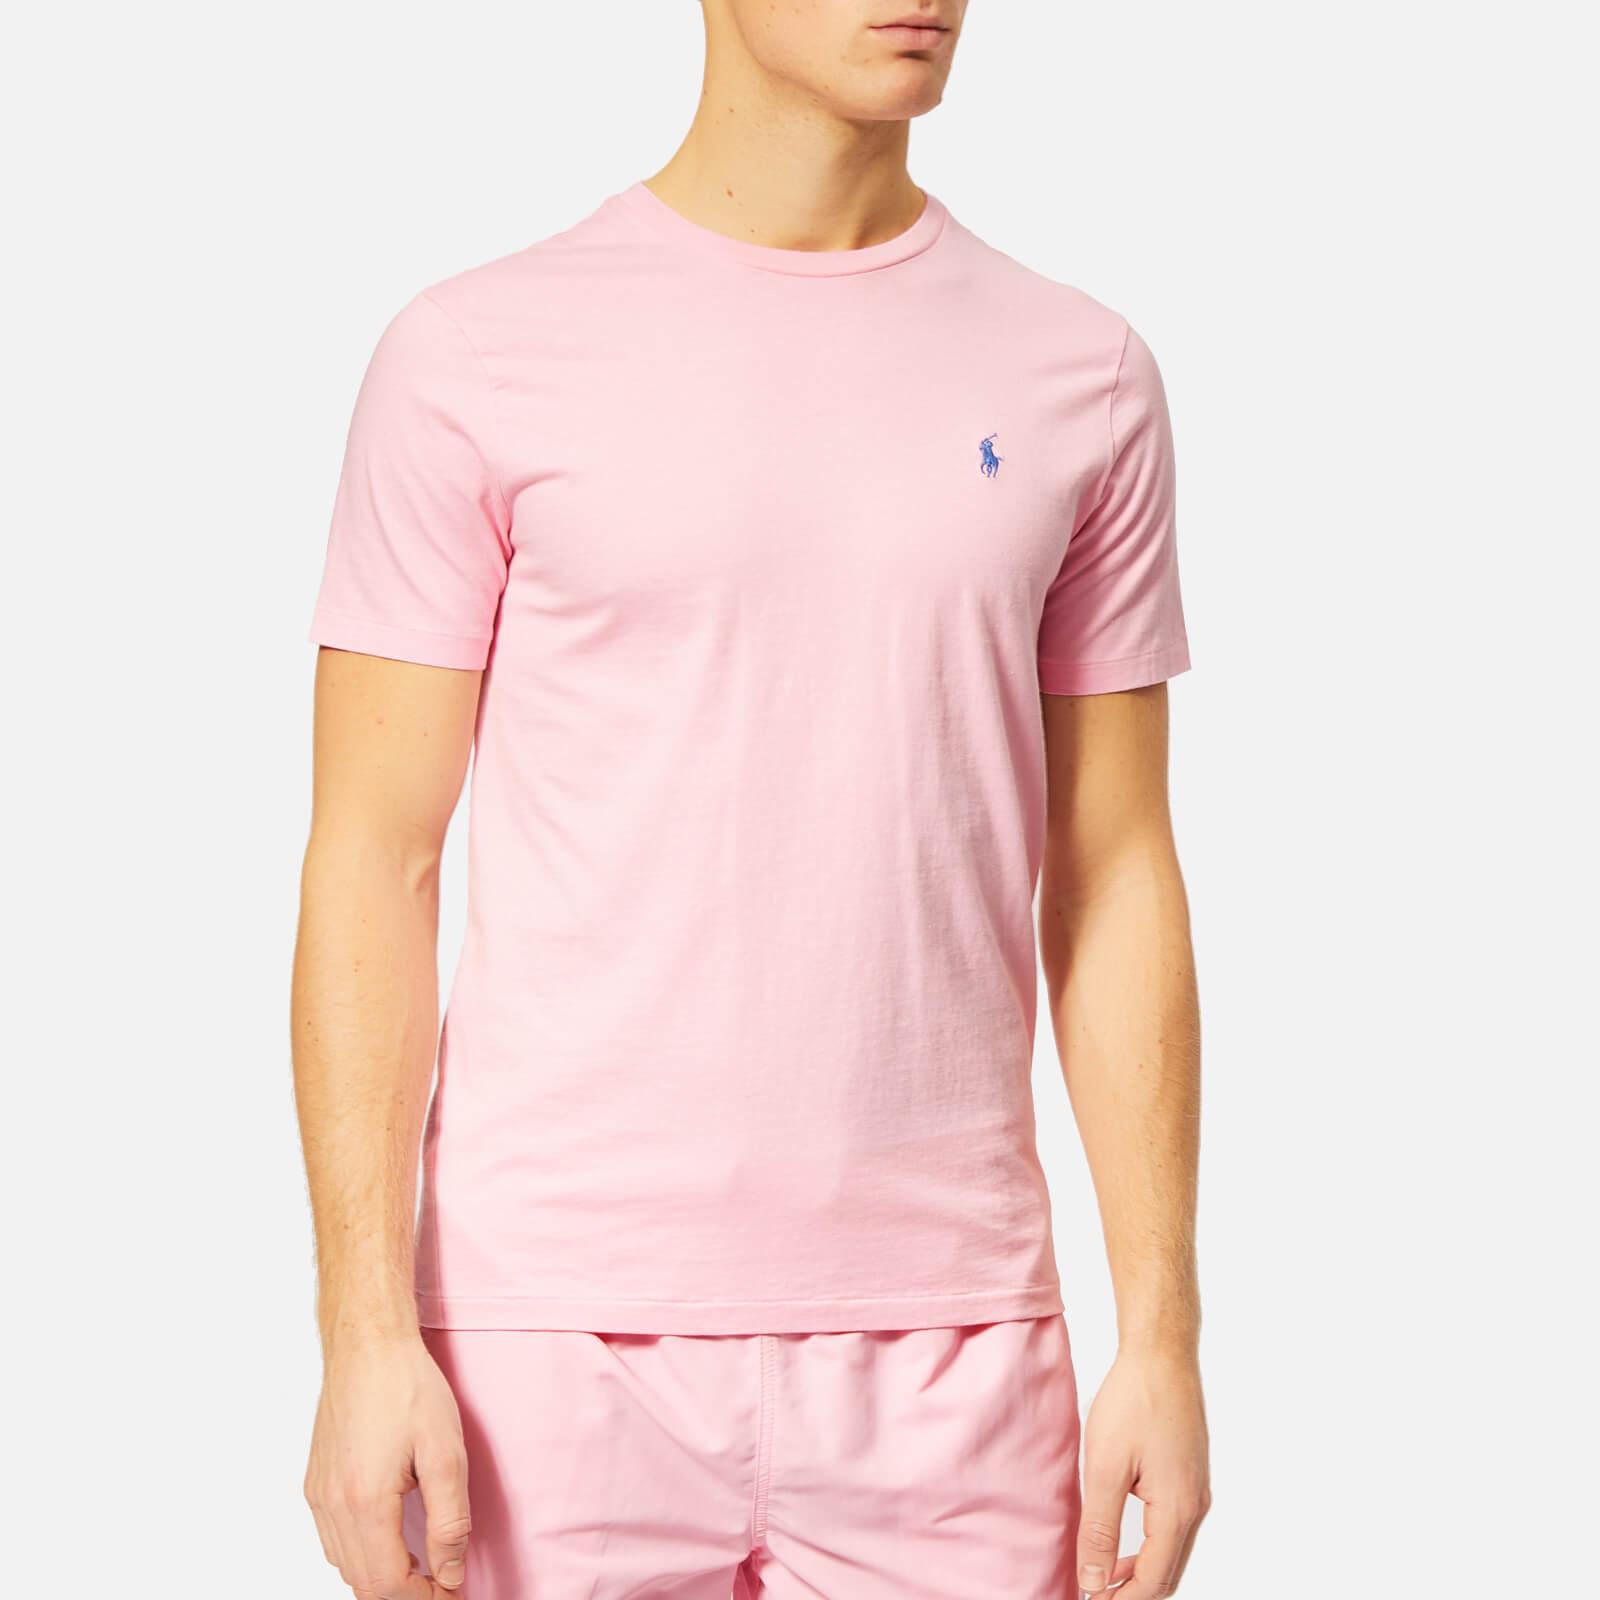 62650c0e Polo Ralph Lauren Men's Custom Slim Fit Crew Neck T-Shirt - Taylor Rose -  Free UK Delivery over £50